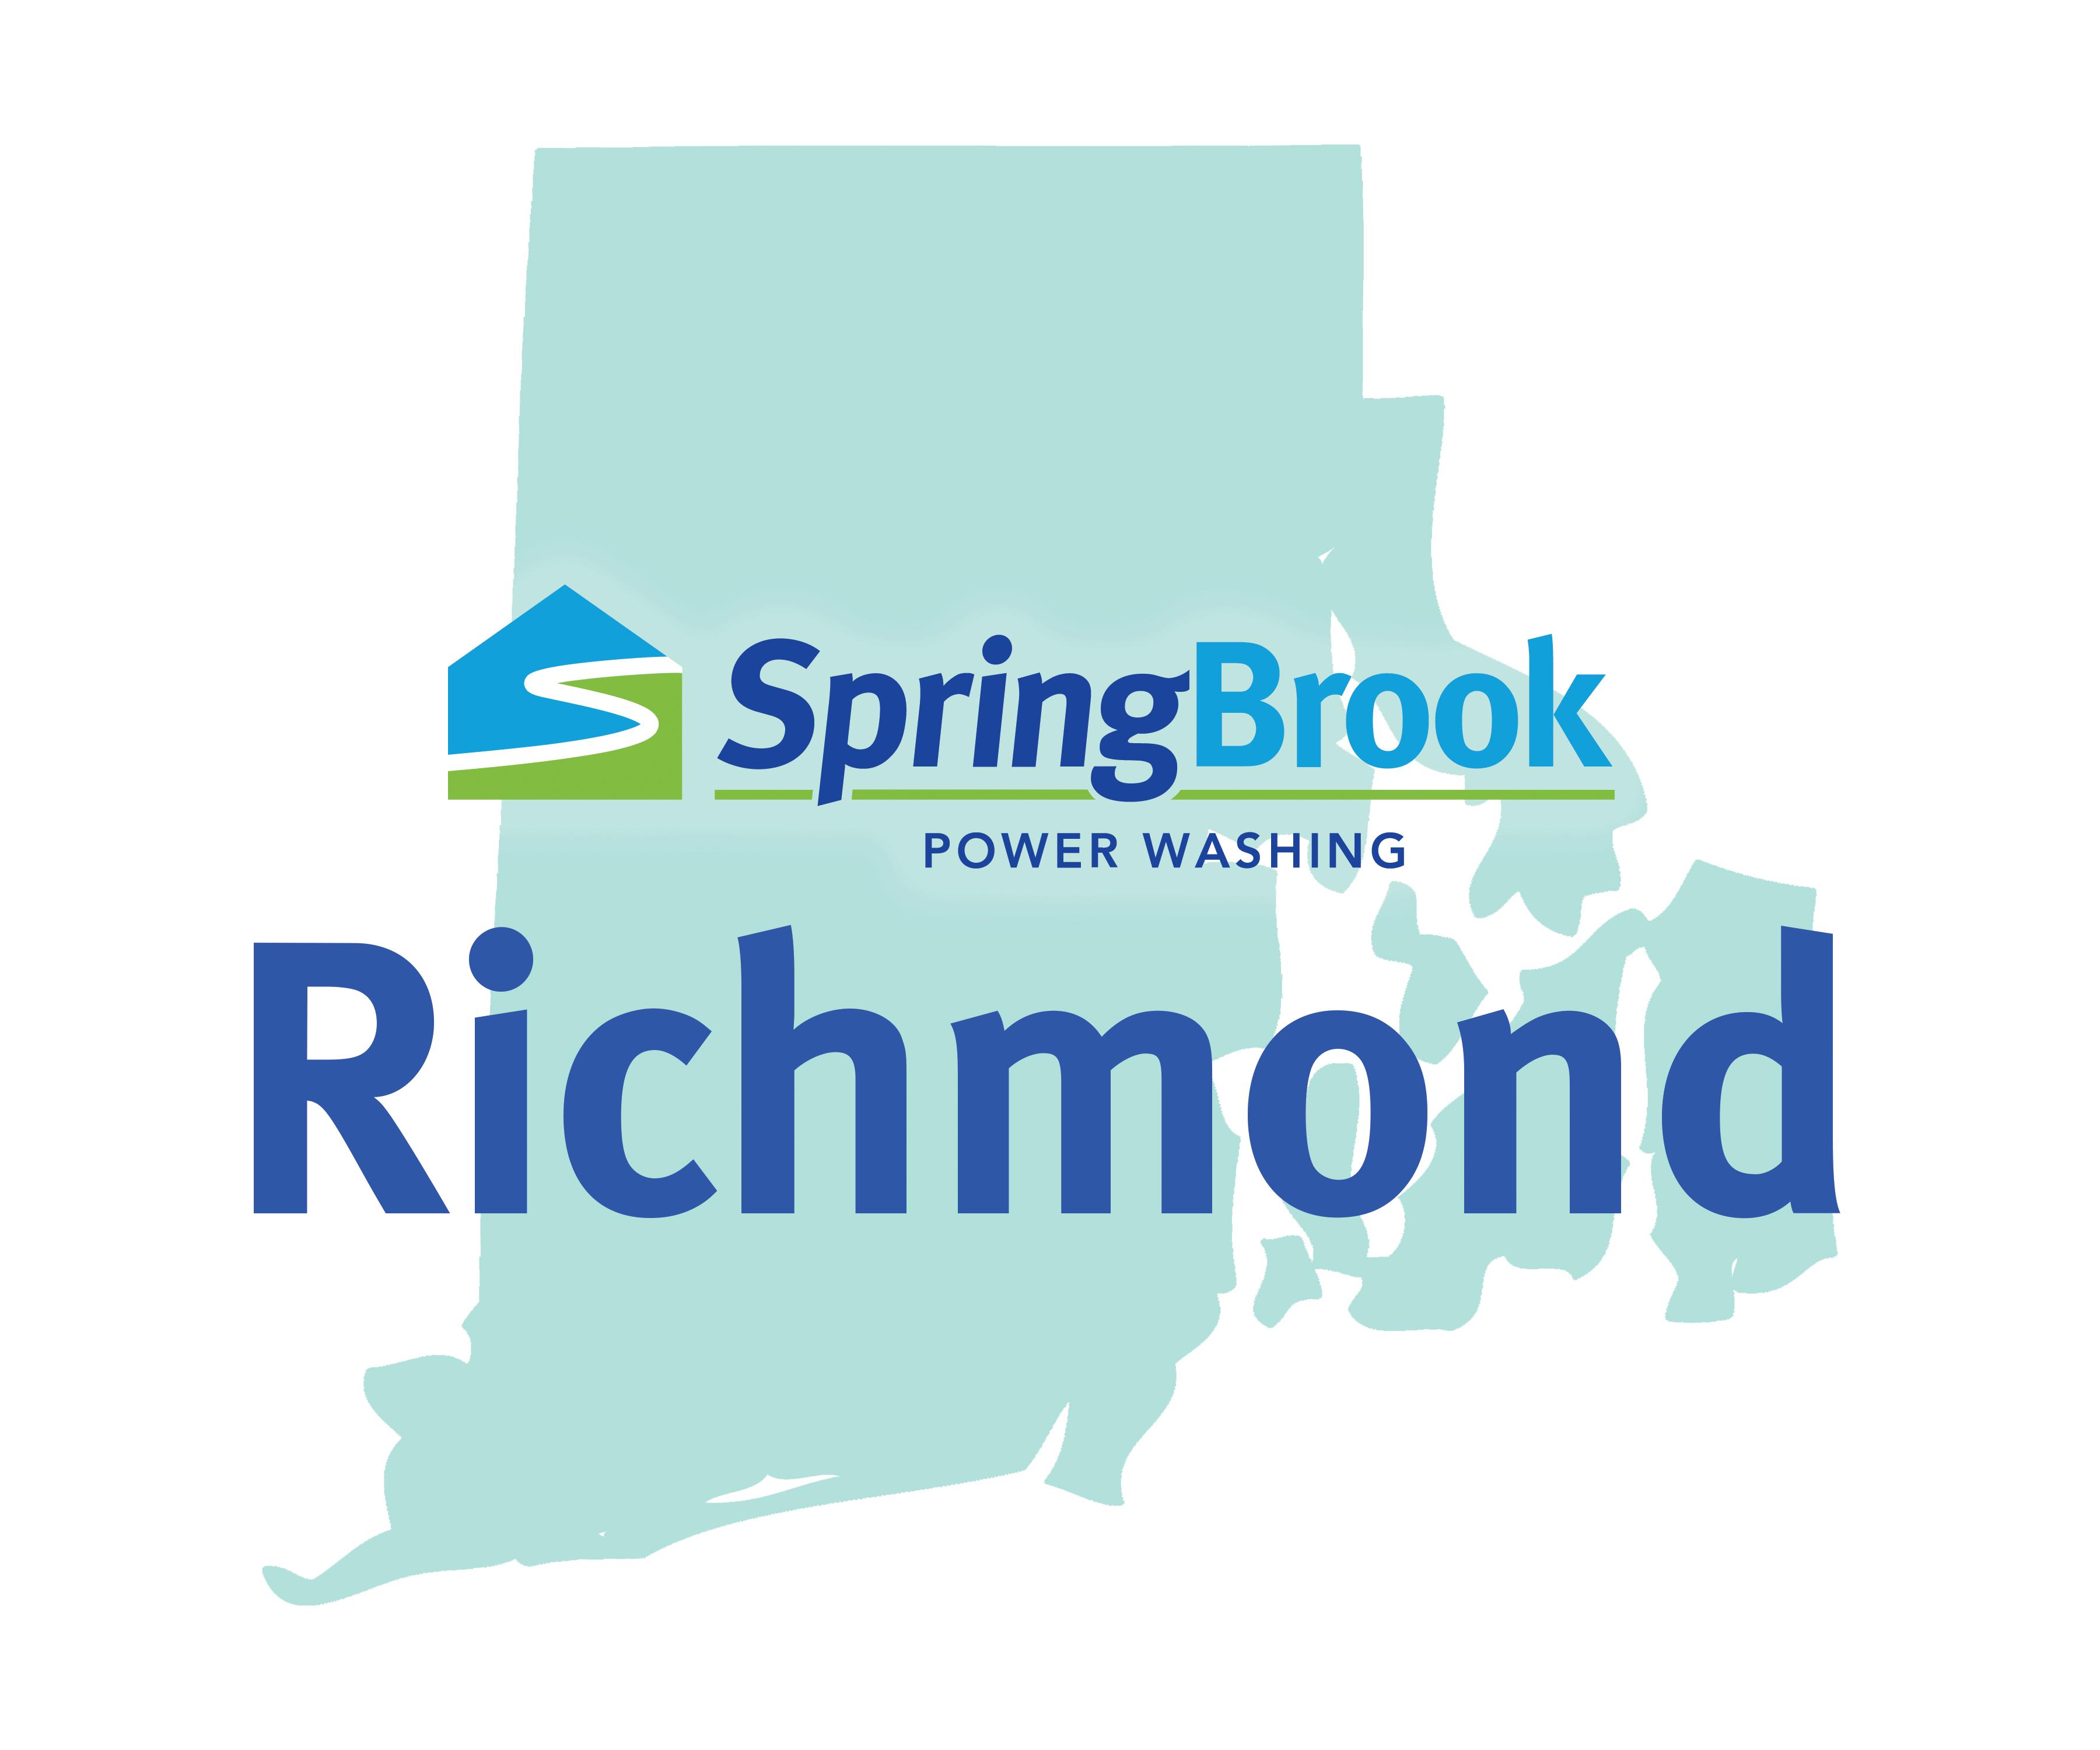 Springbrook Power Washing Richmond Rhode Island